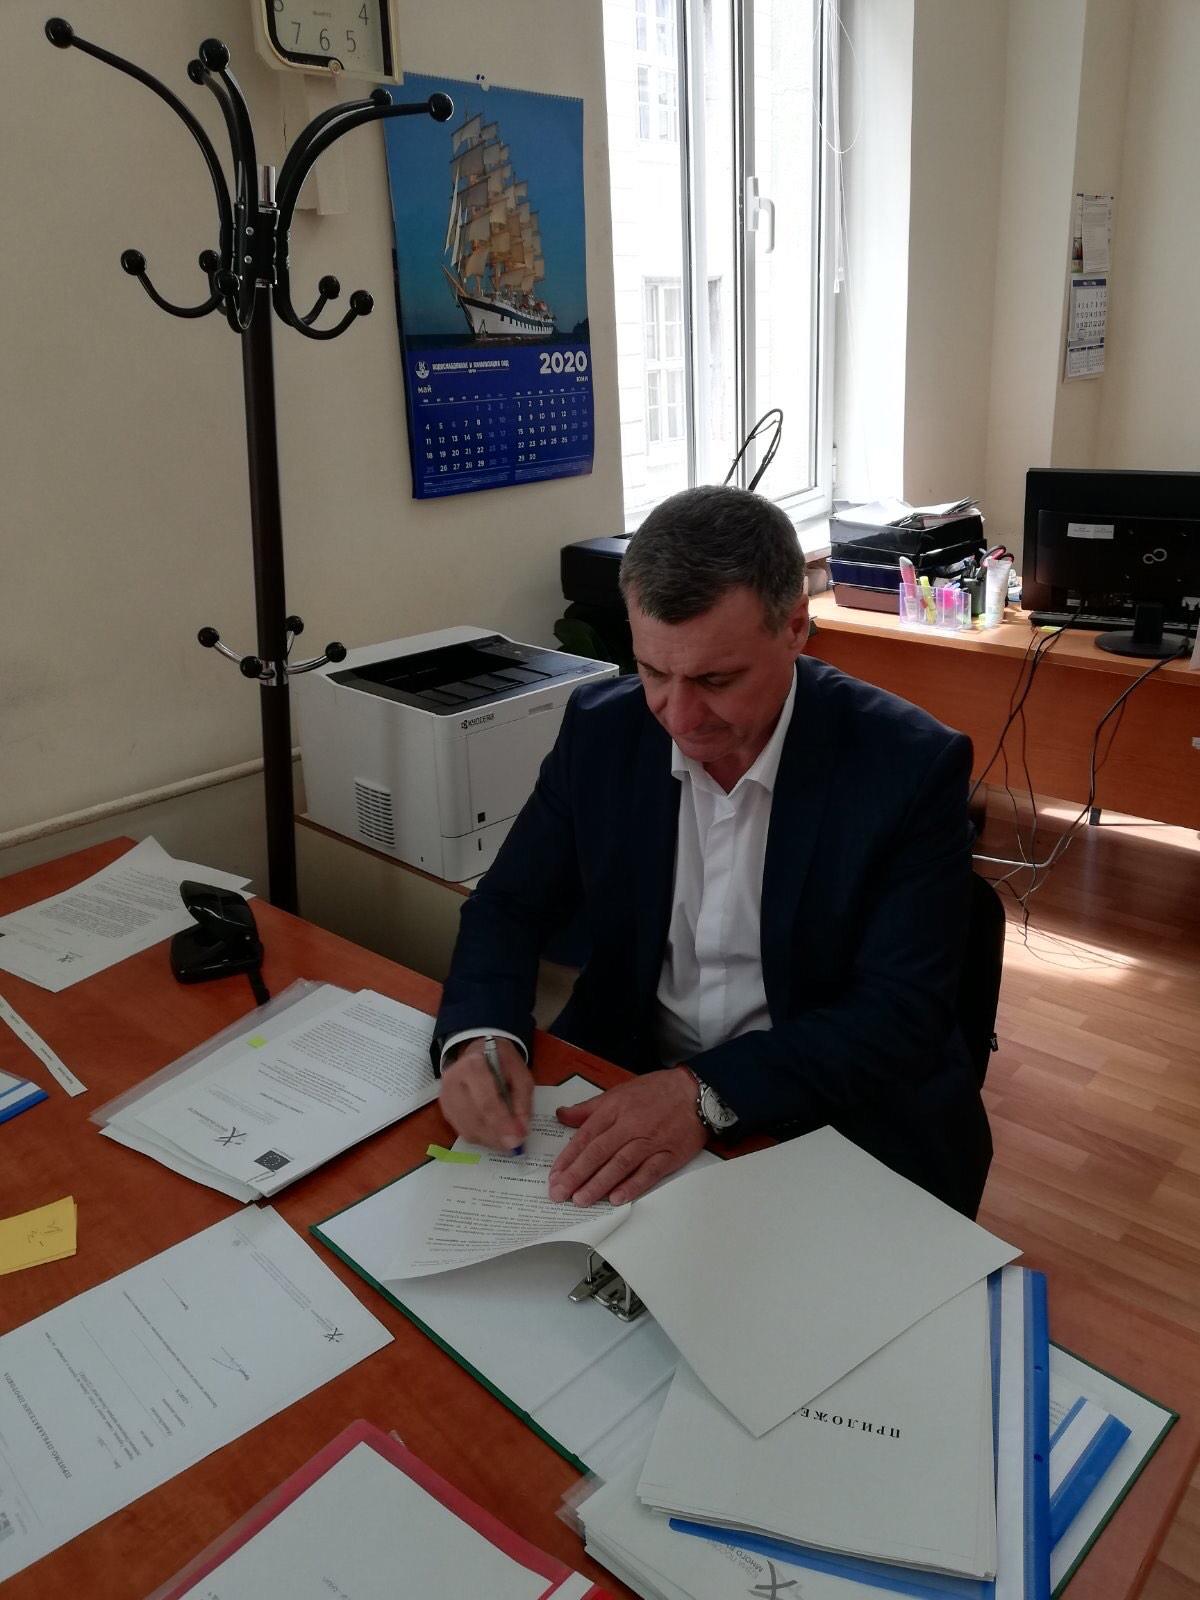 Д-р Коев подписа договора за закриване и рекултивация на сметището